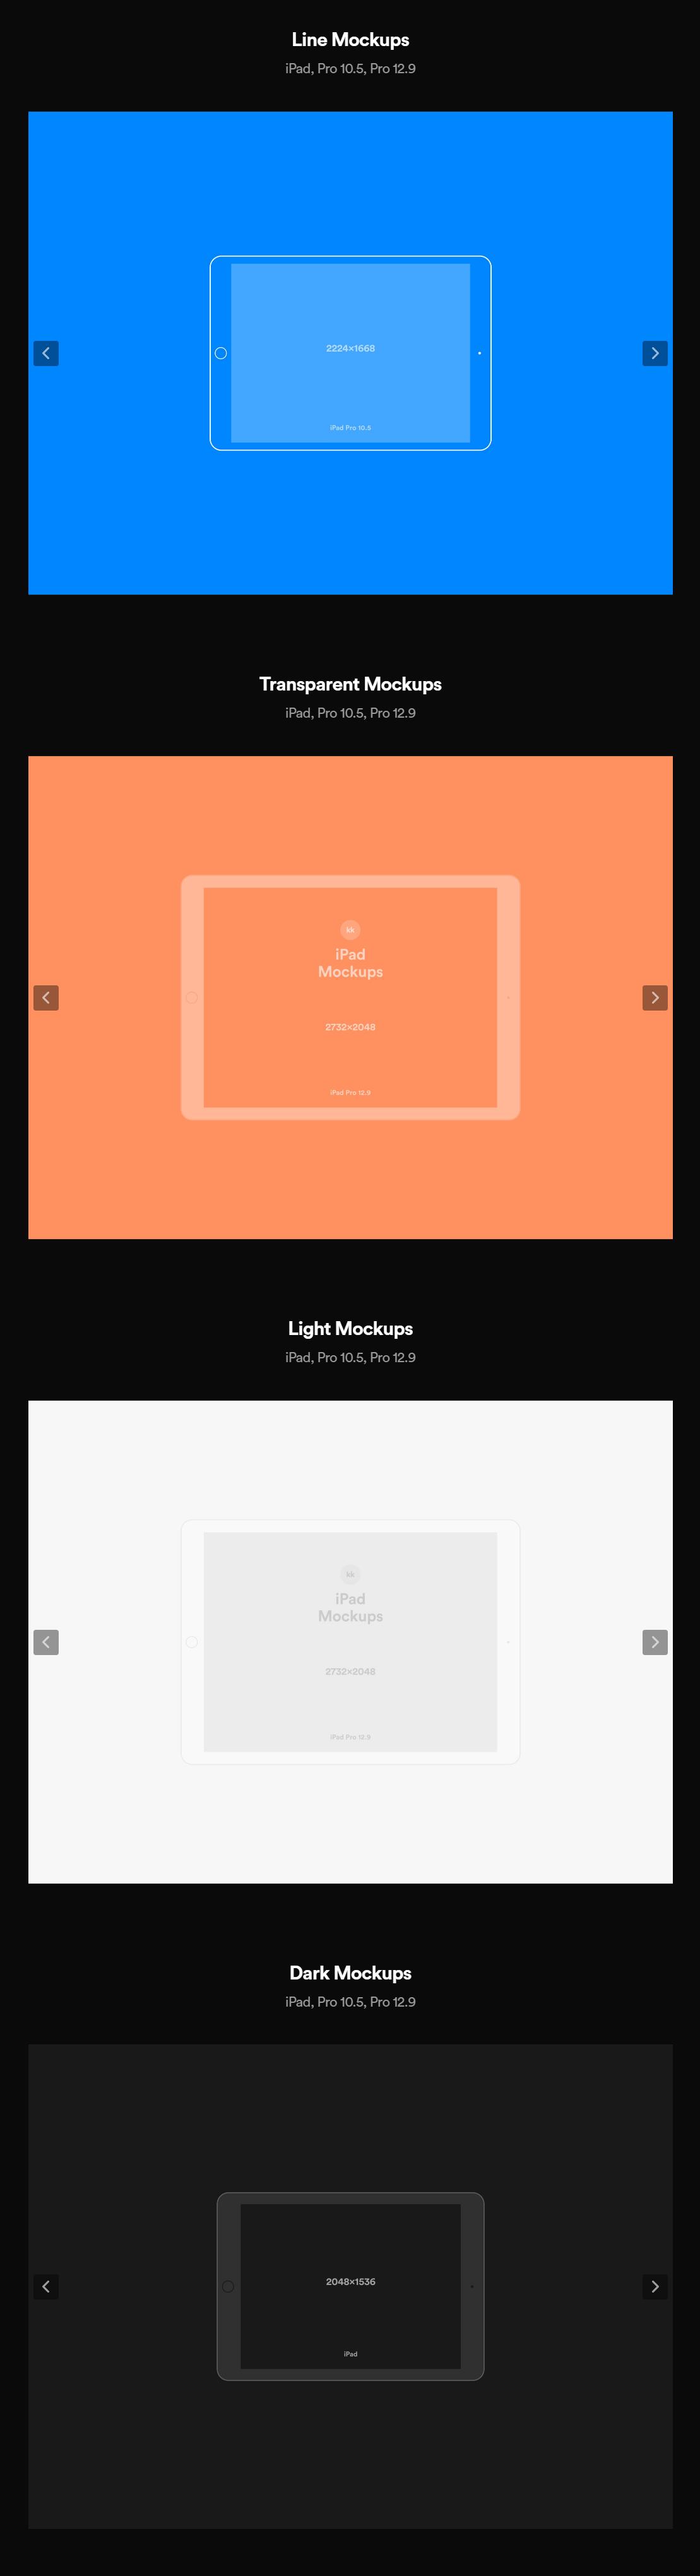 Free iPad Vector Presentation Mockups